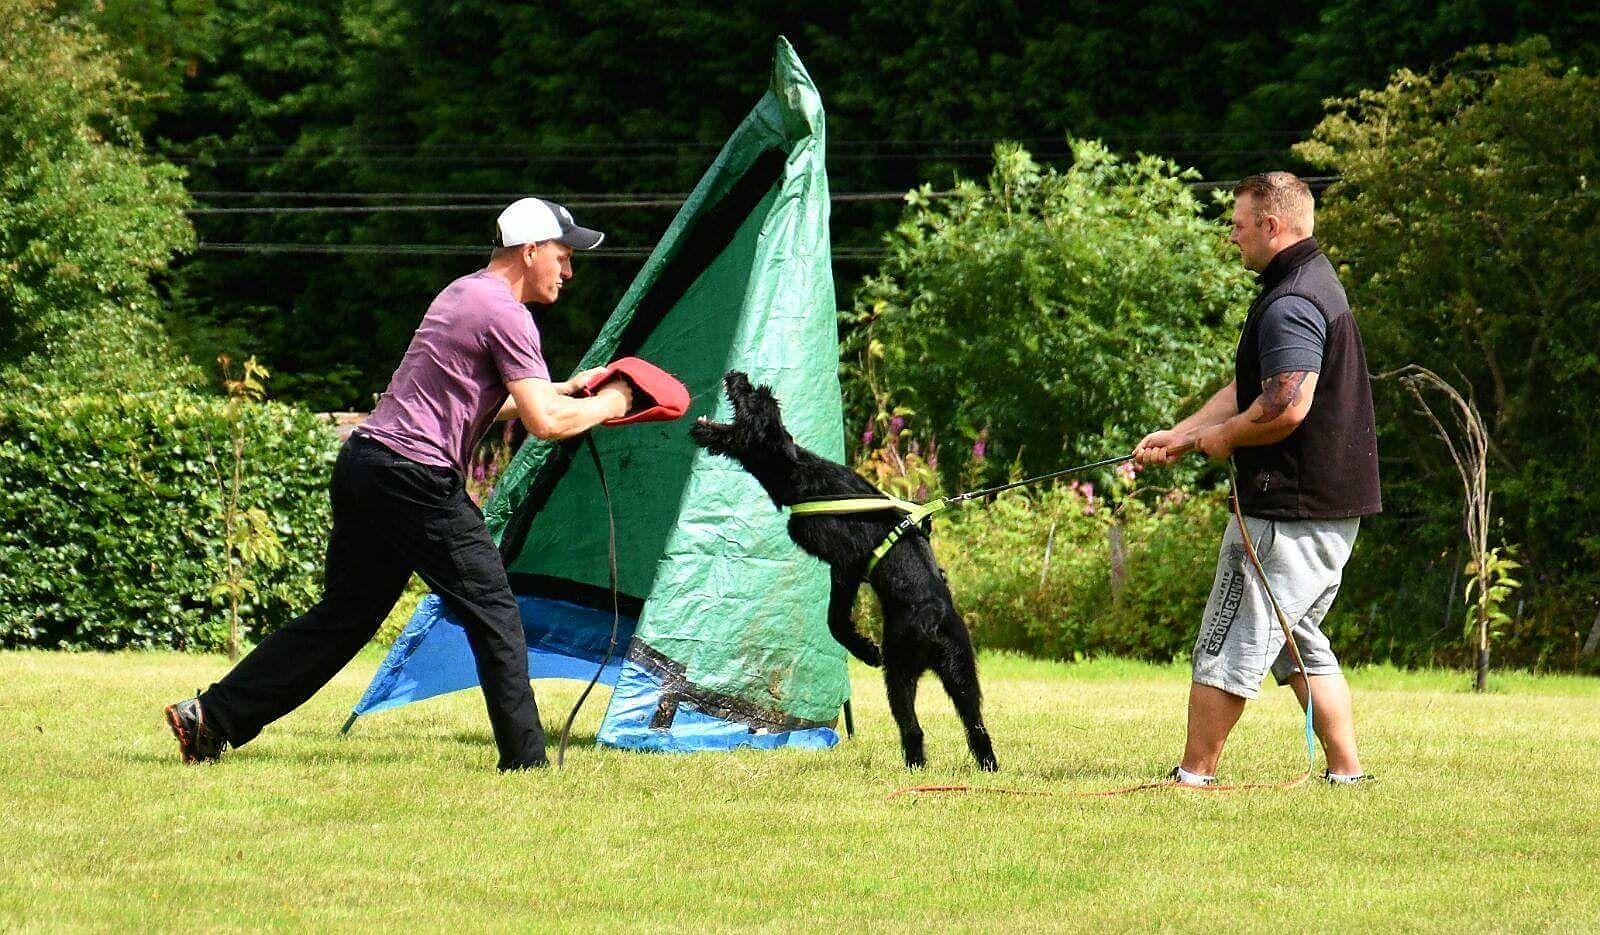 Dog Handling VINOVIUM ASSOCIATES